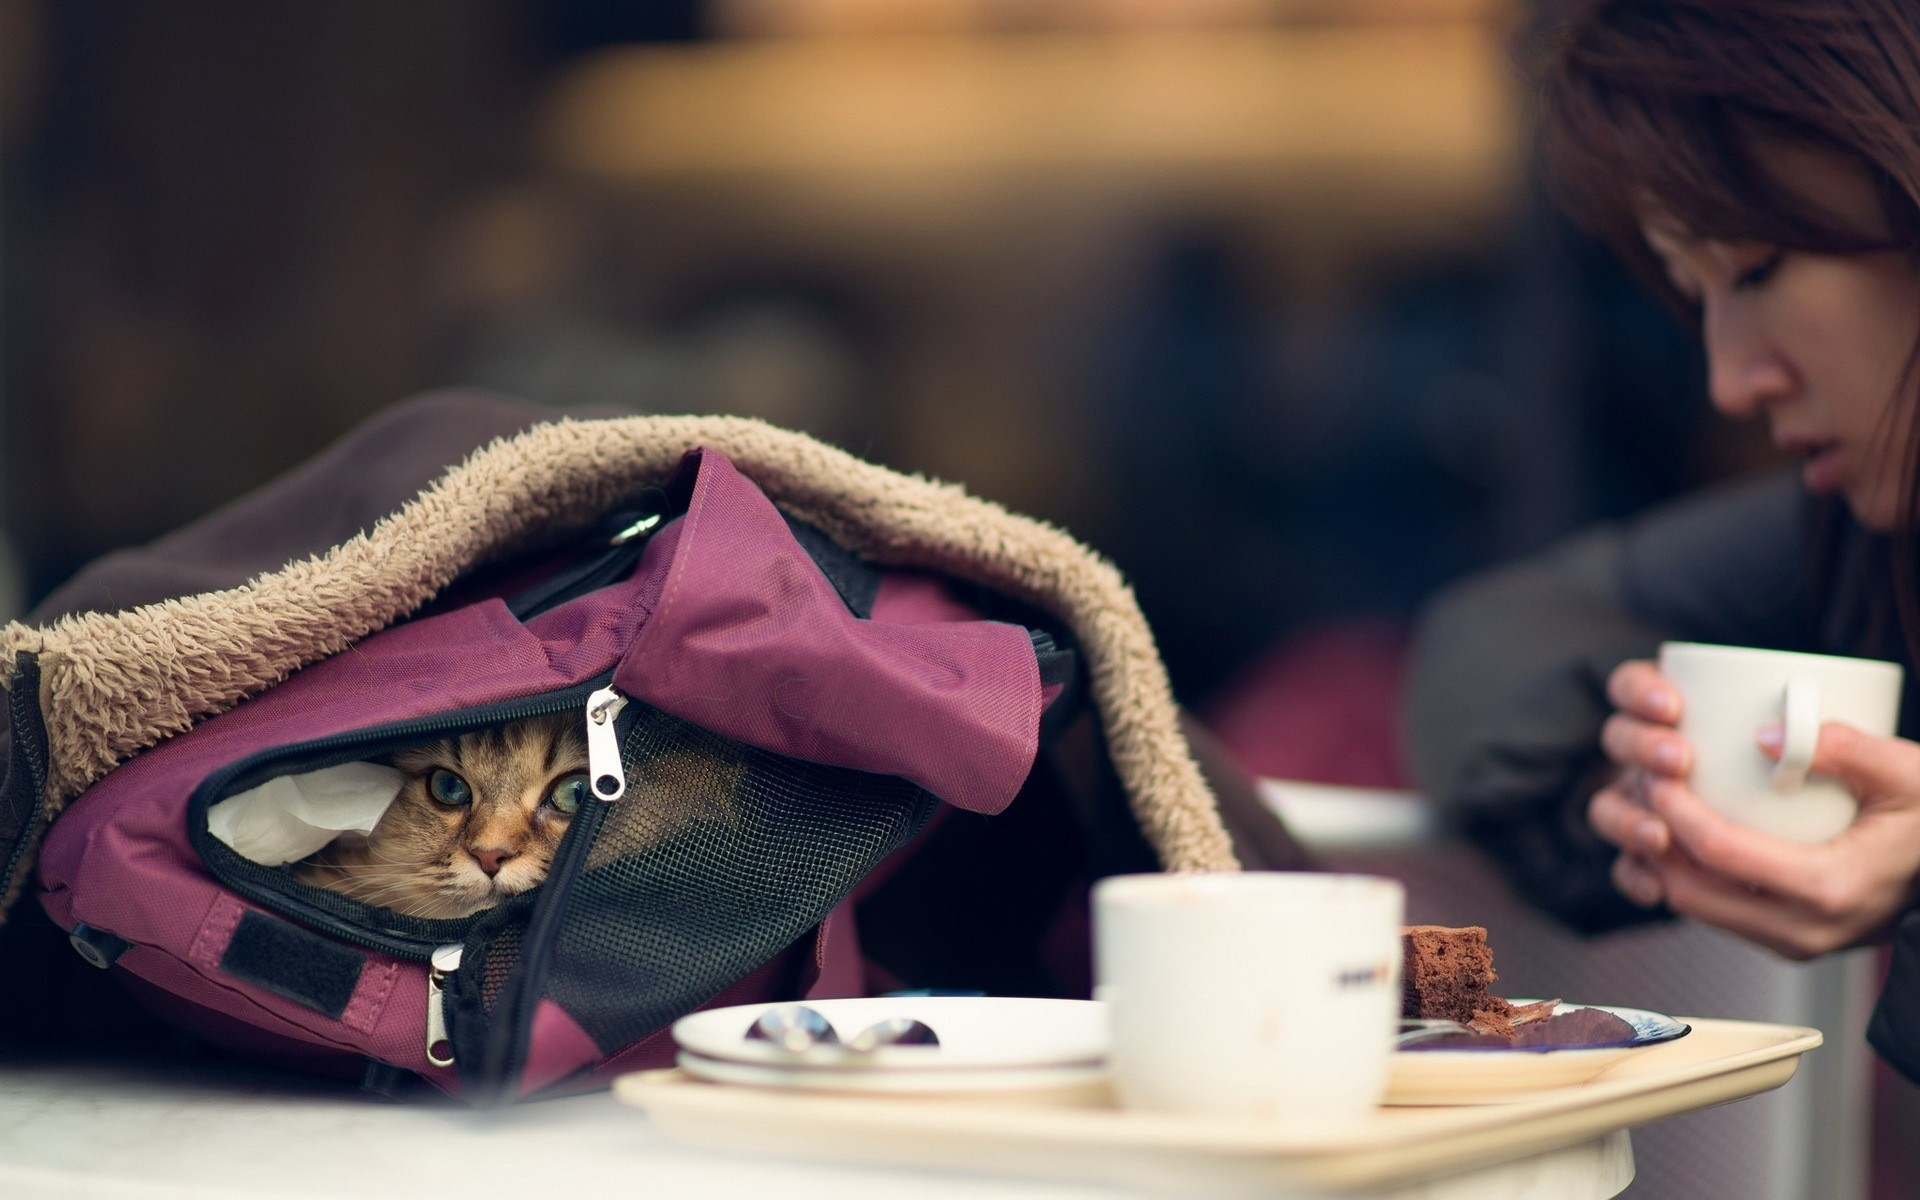 کیف گربه - bag cat